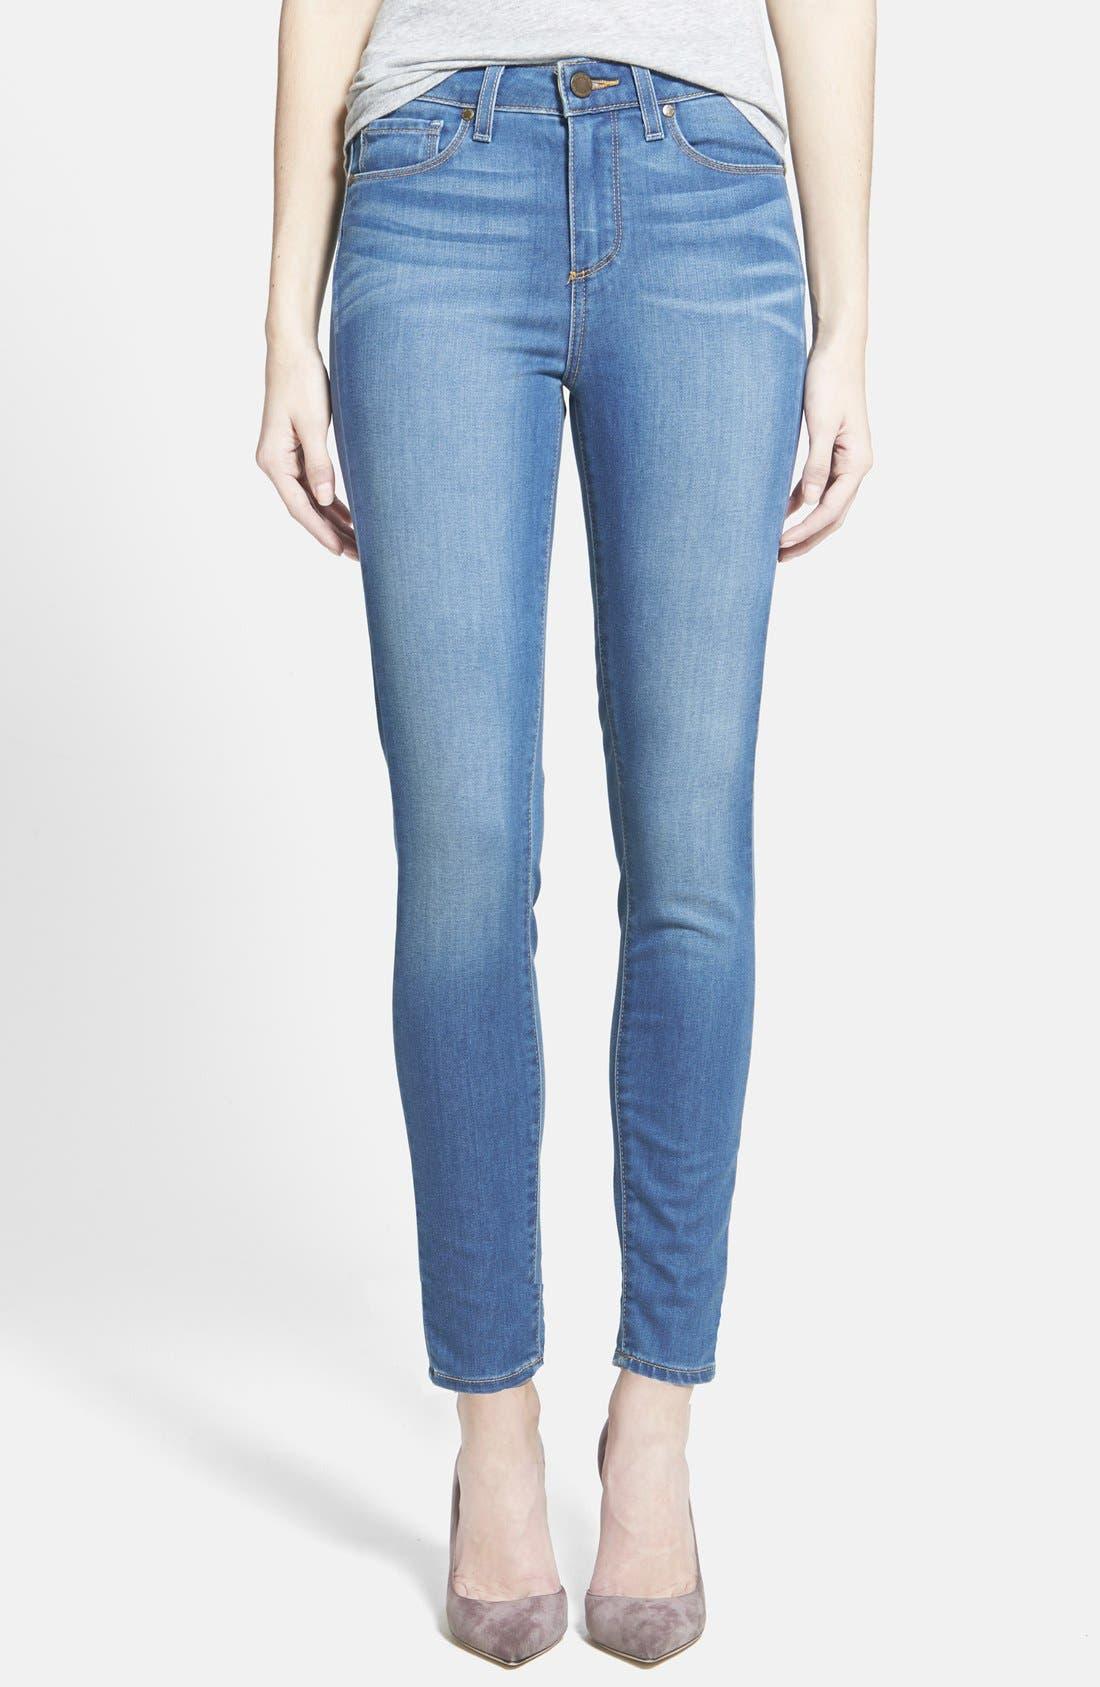 Main Image - Paige Denim 'Hoxton' Skinny Ankle Jeans (Halstead Blue)